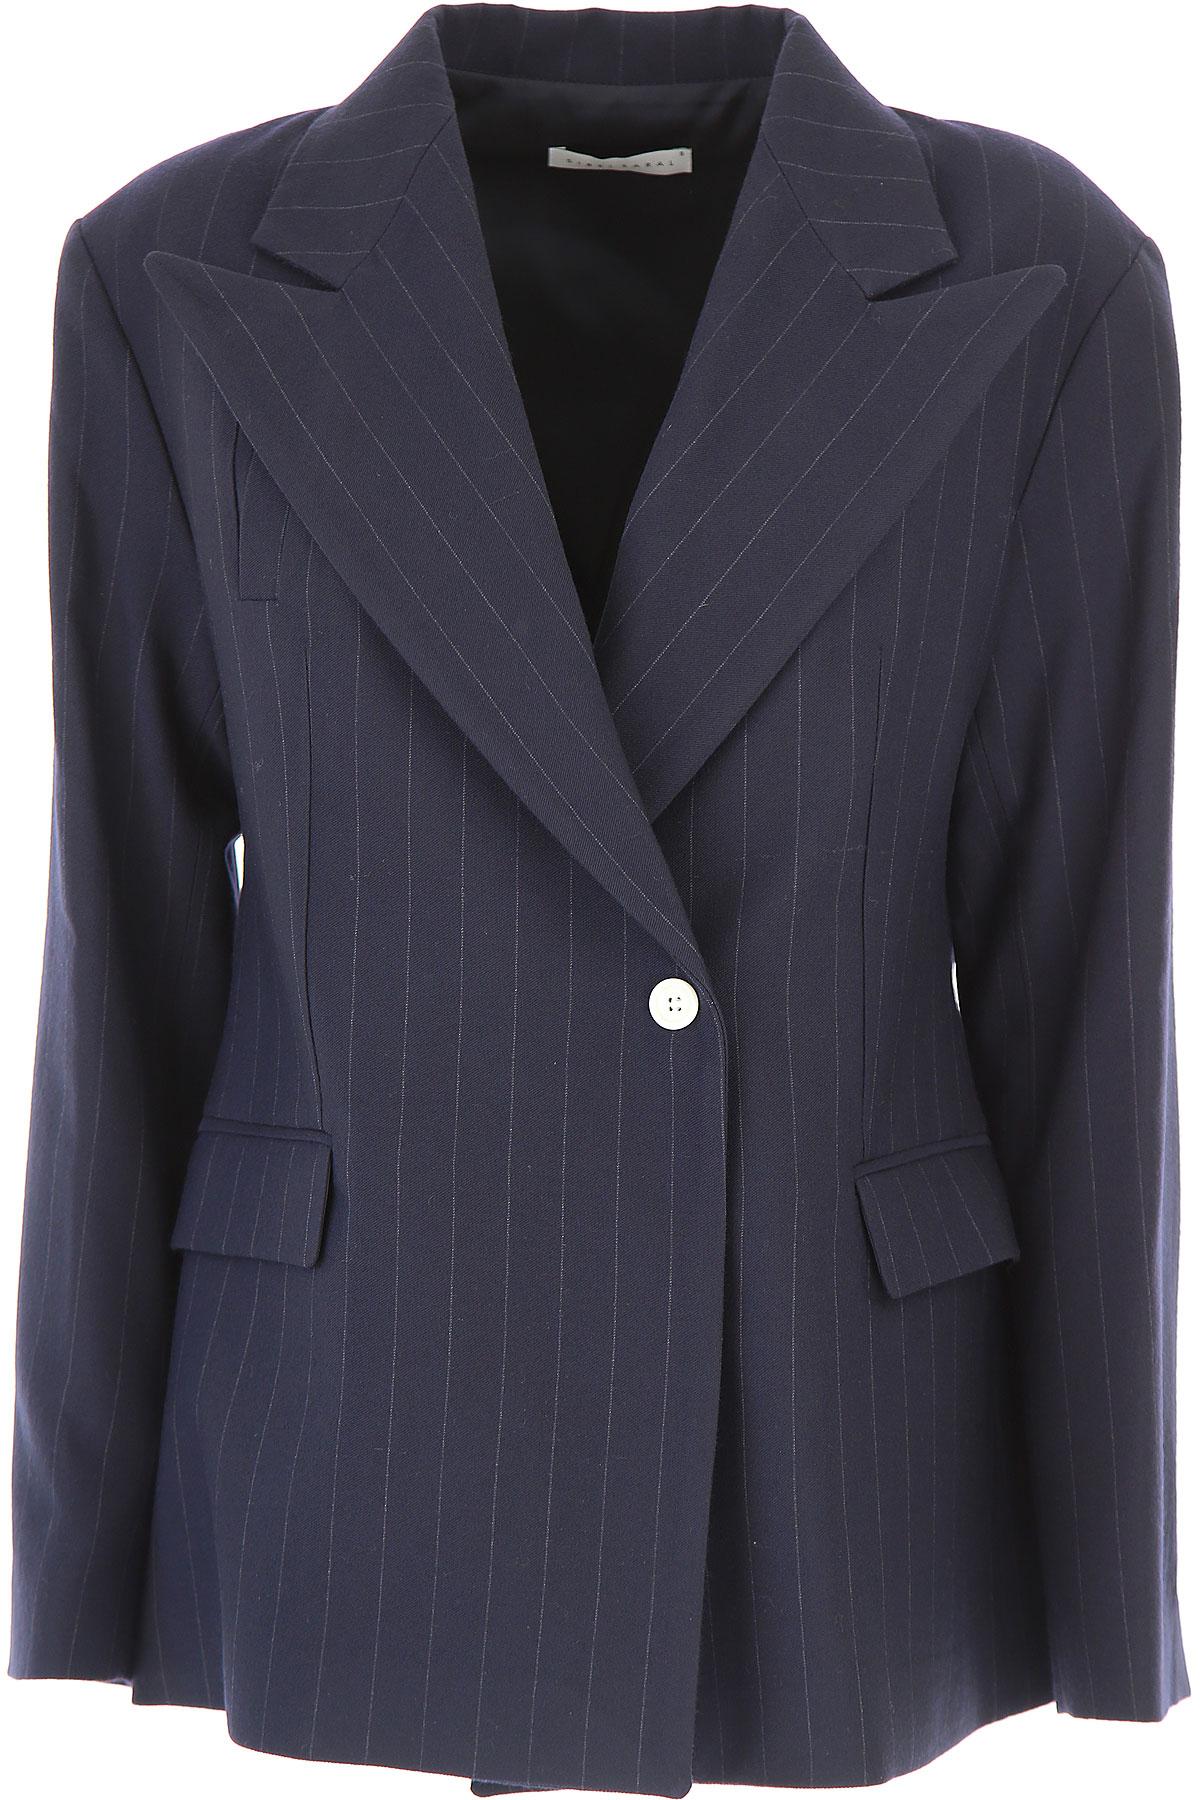 Image of Sibel Saral Blazer for Women, Dark Navy Blue, Virgin wool, 2017, 4 6